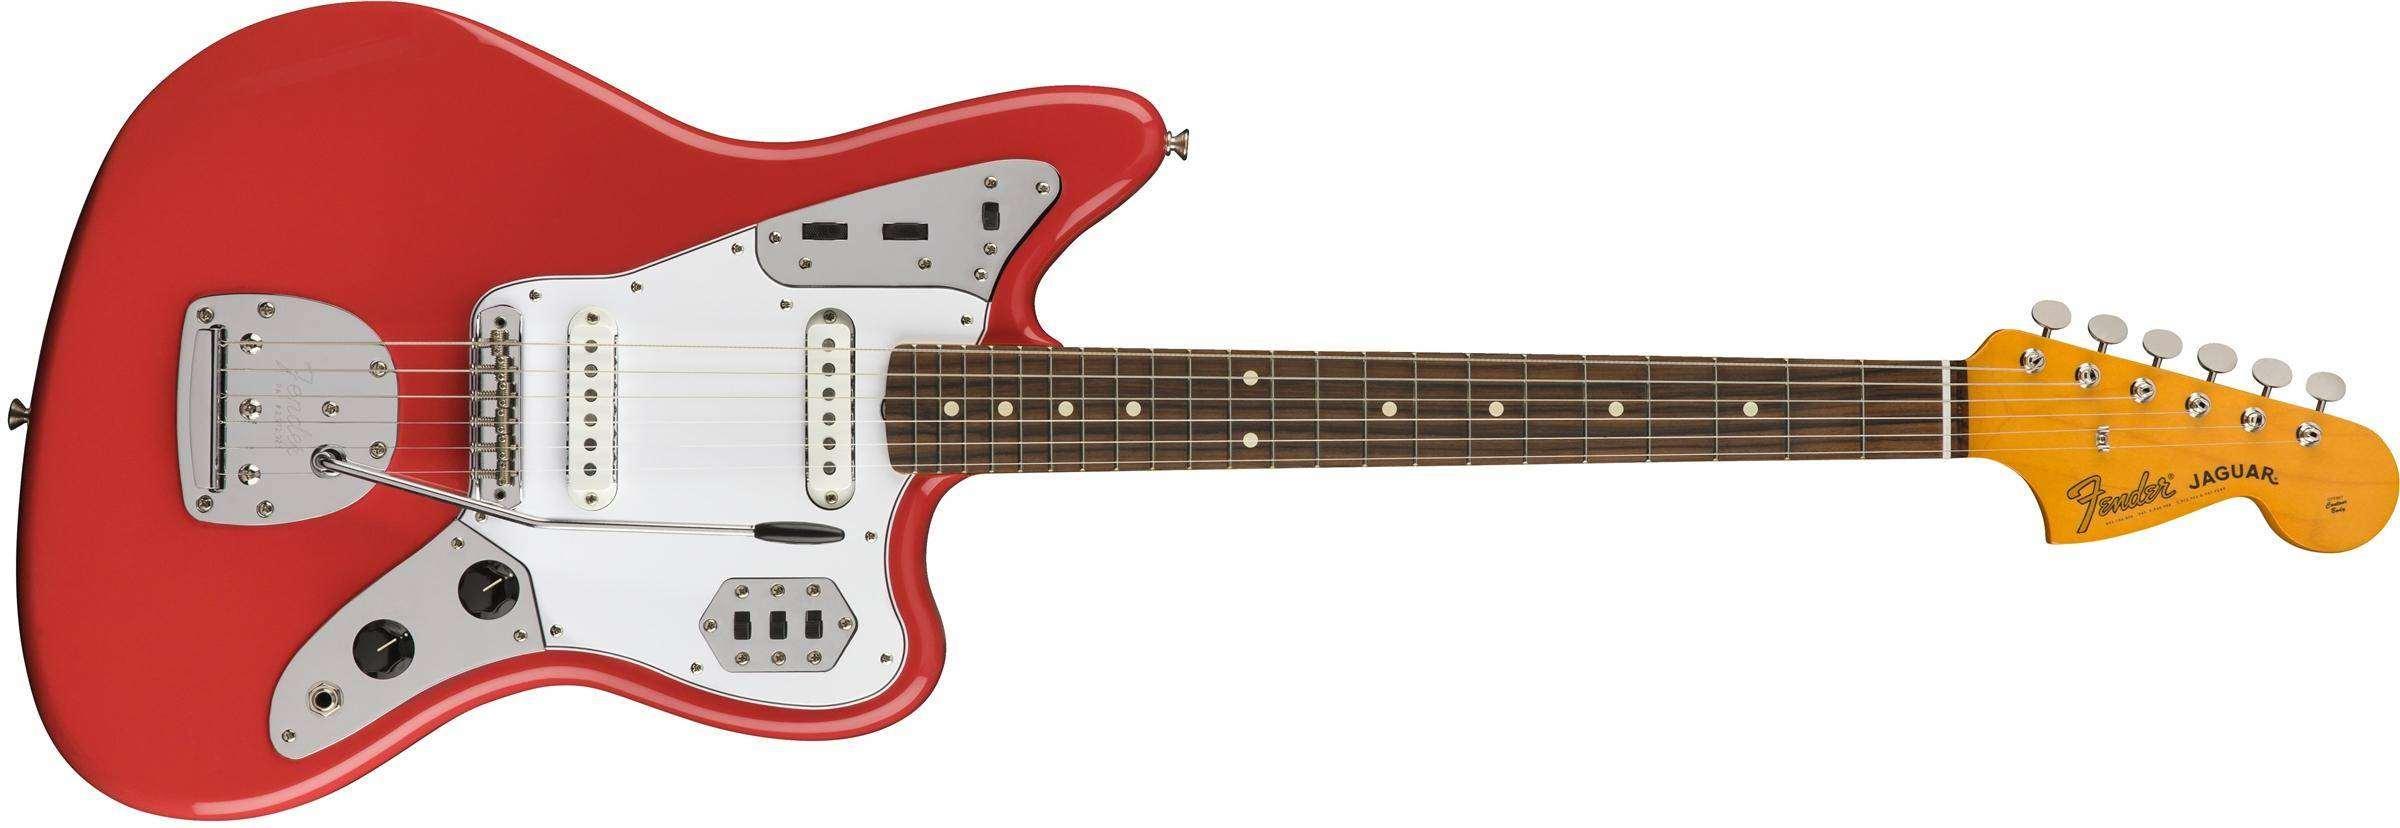 134b3eec3c87cf Fender Classic 60's Jaguar Lacquer, Pau Ferro Fingerboard - Fiesta Red